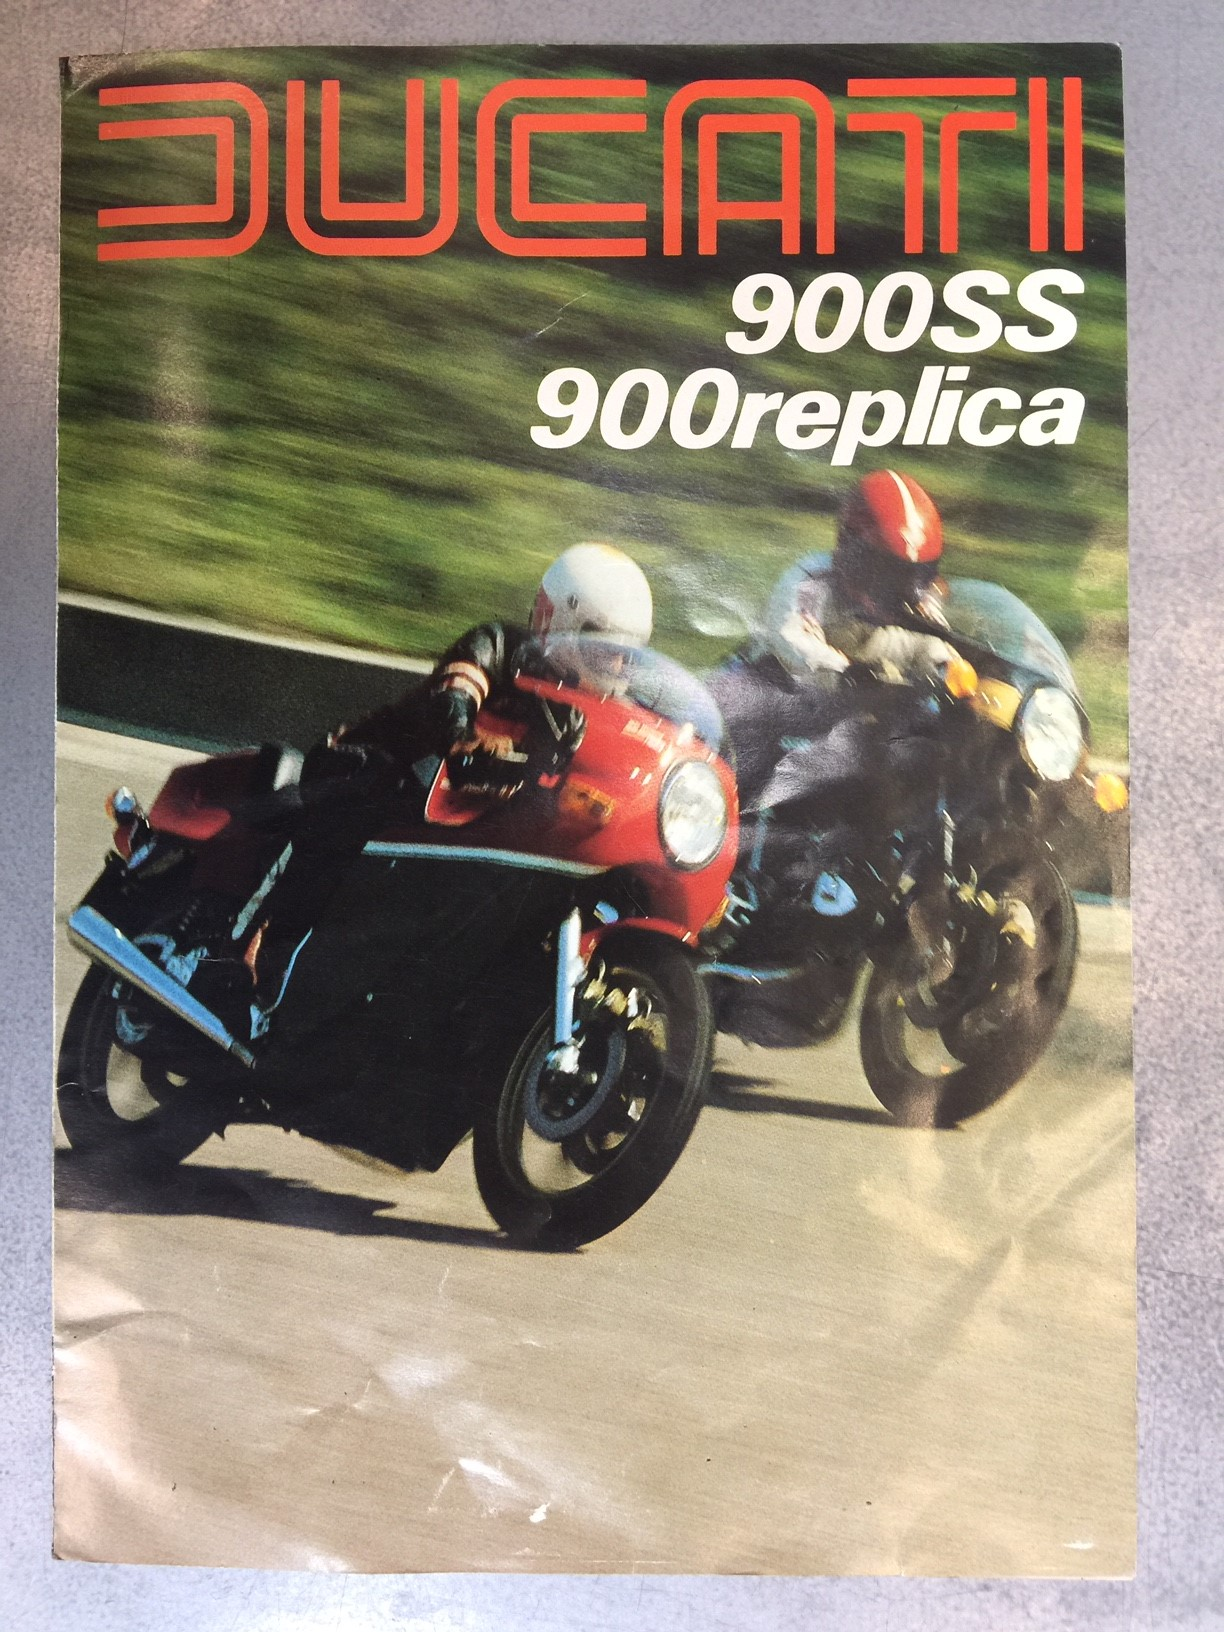 Bevel Heaven Ducati Parts  925 798